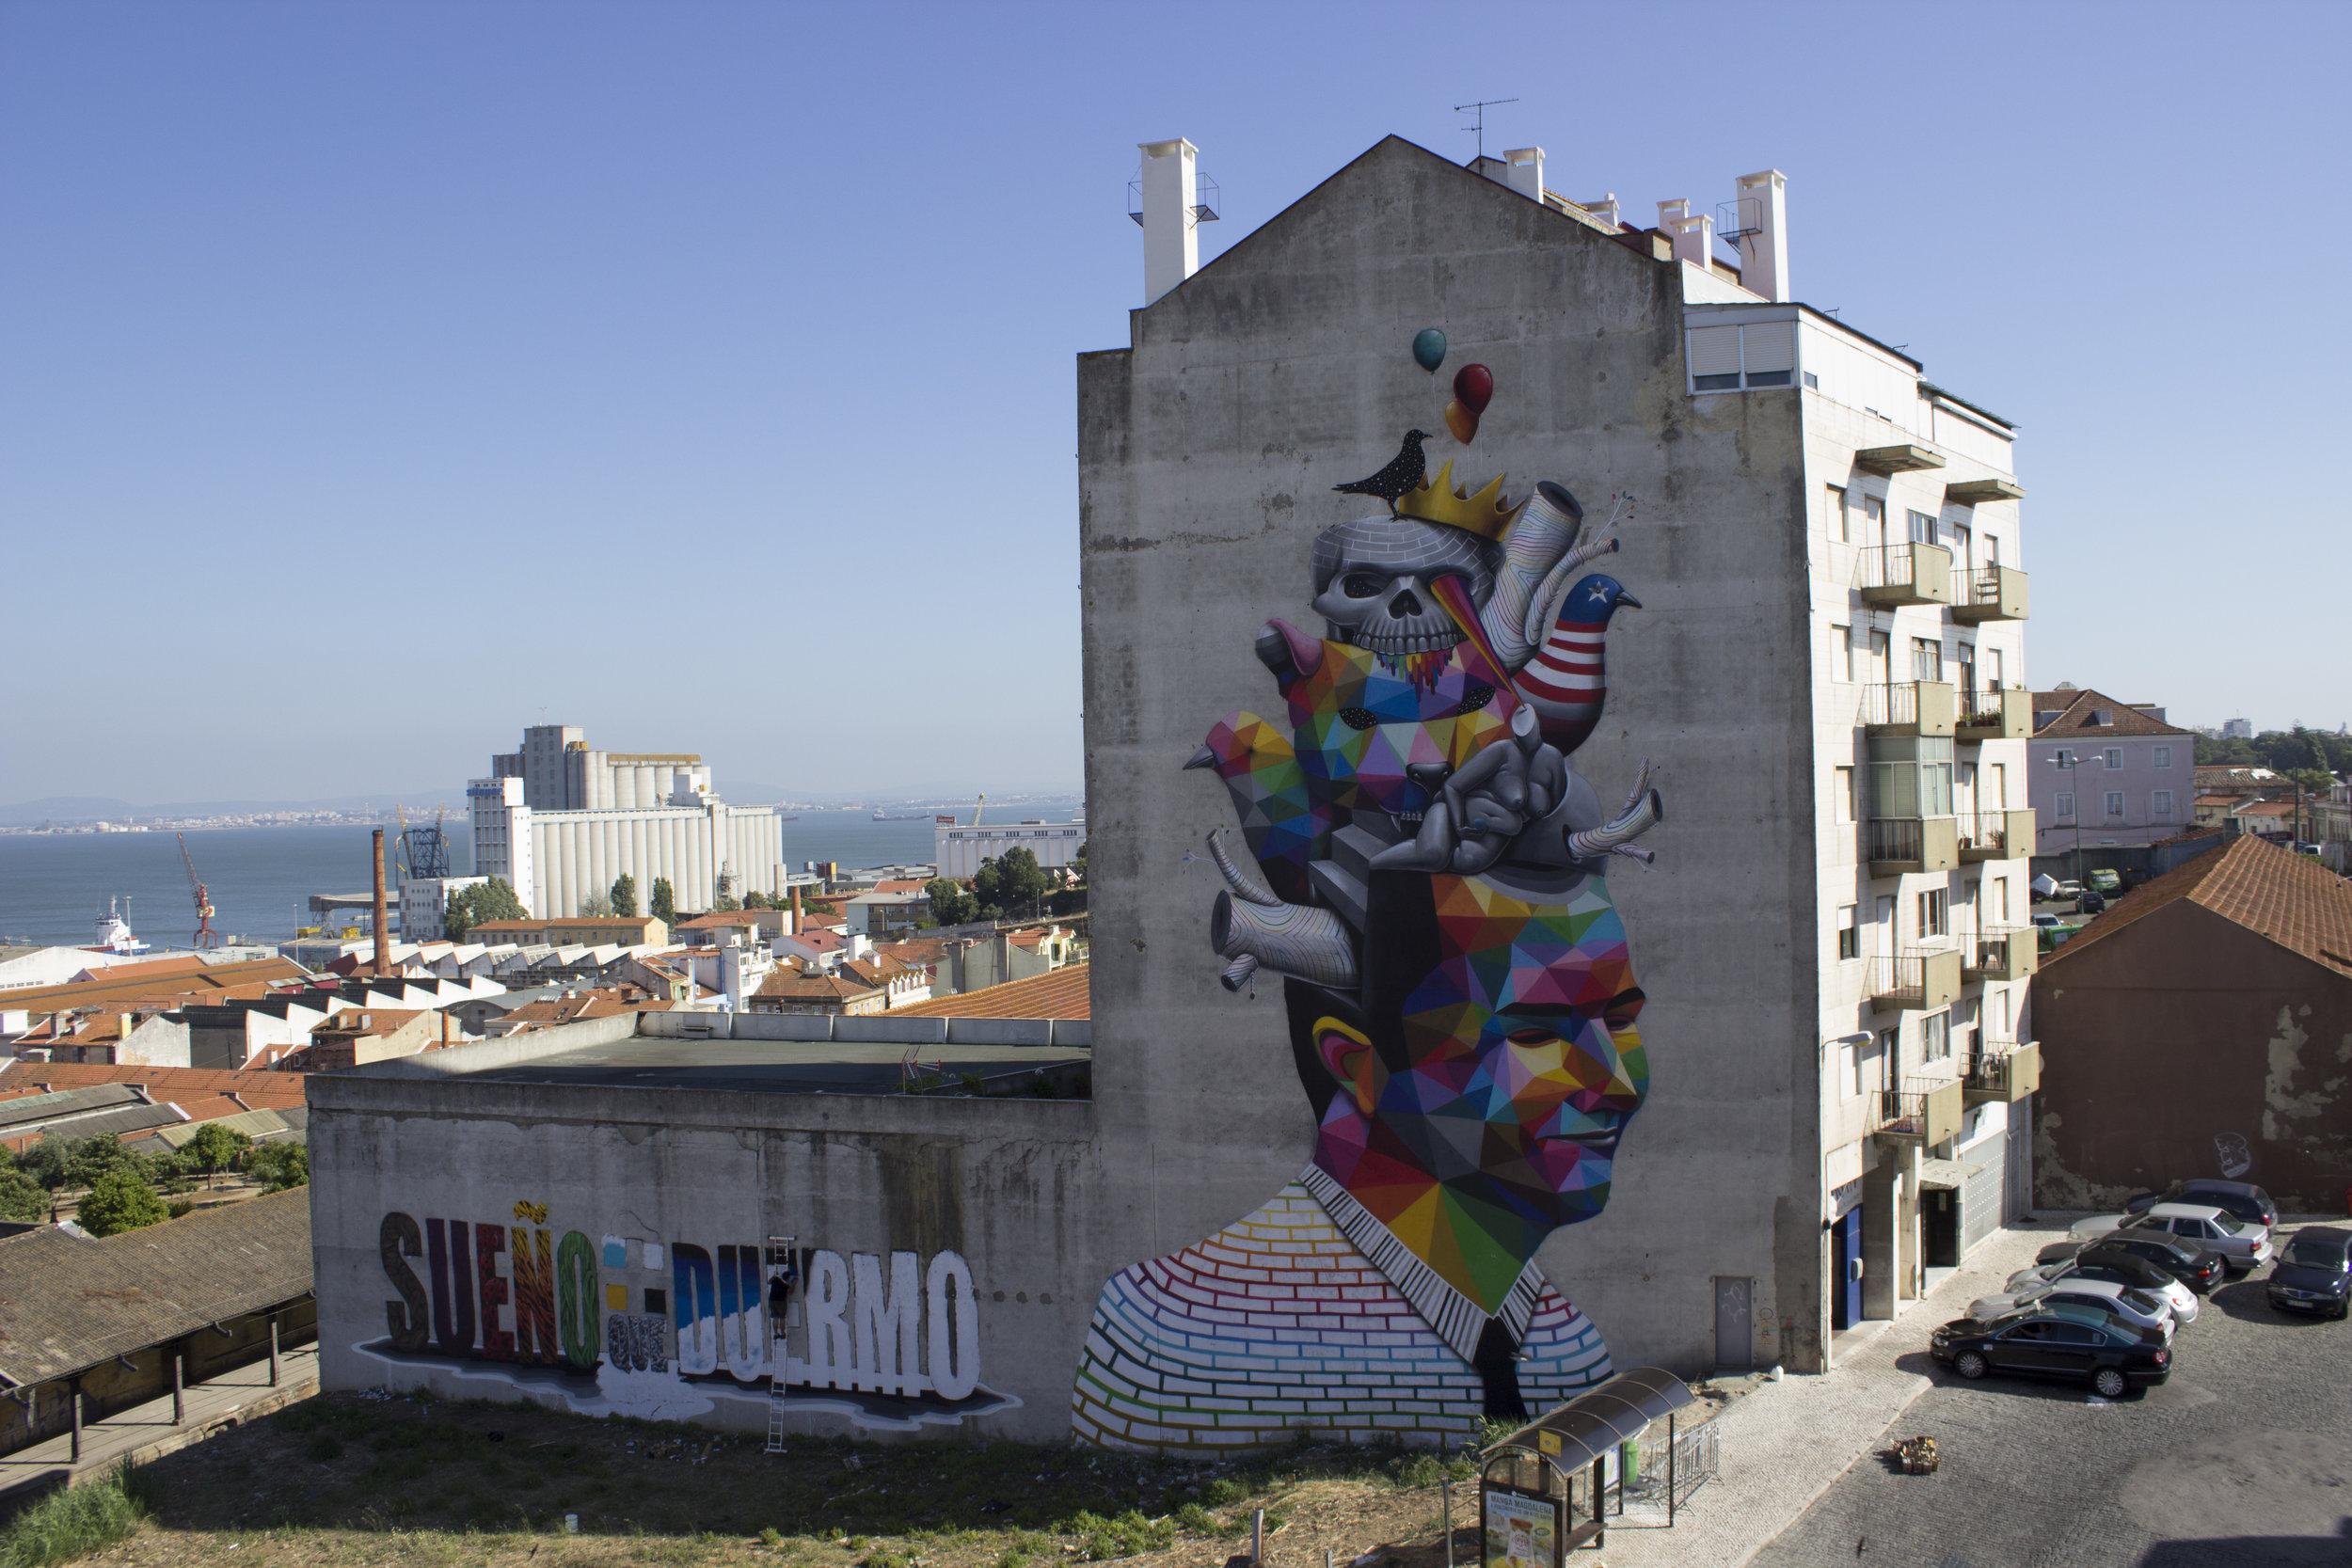 Lisbon,2014 by Okuda San Miguel.